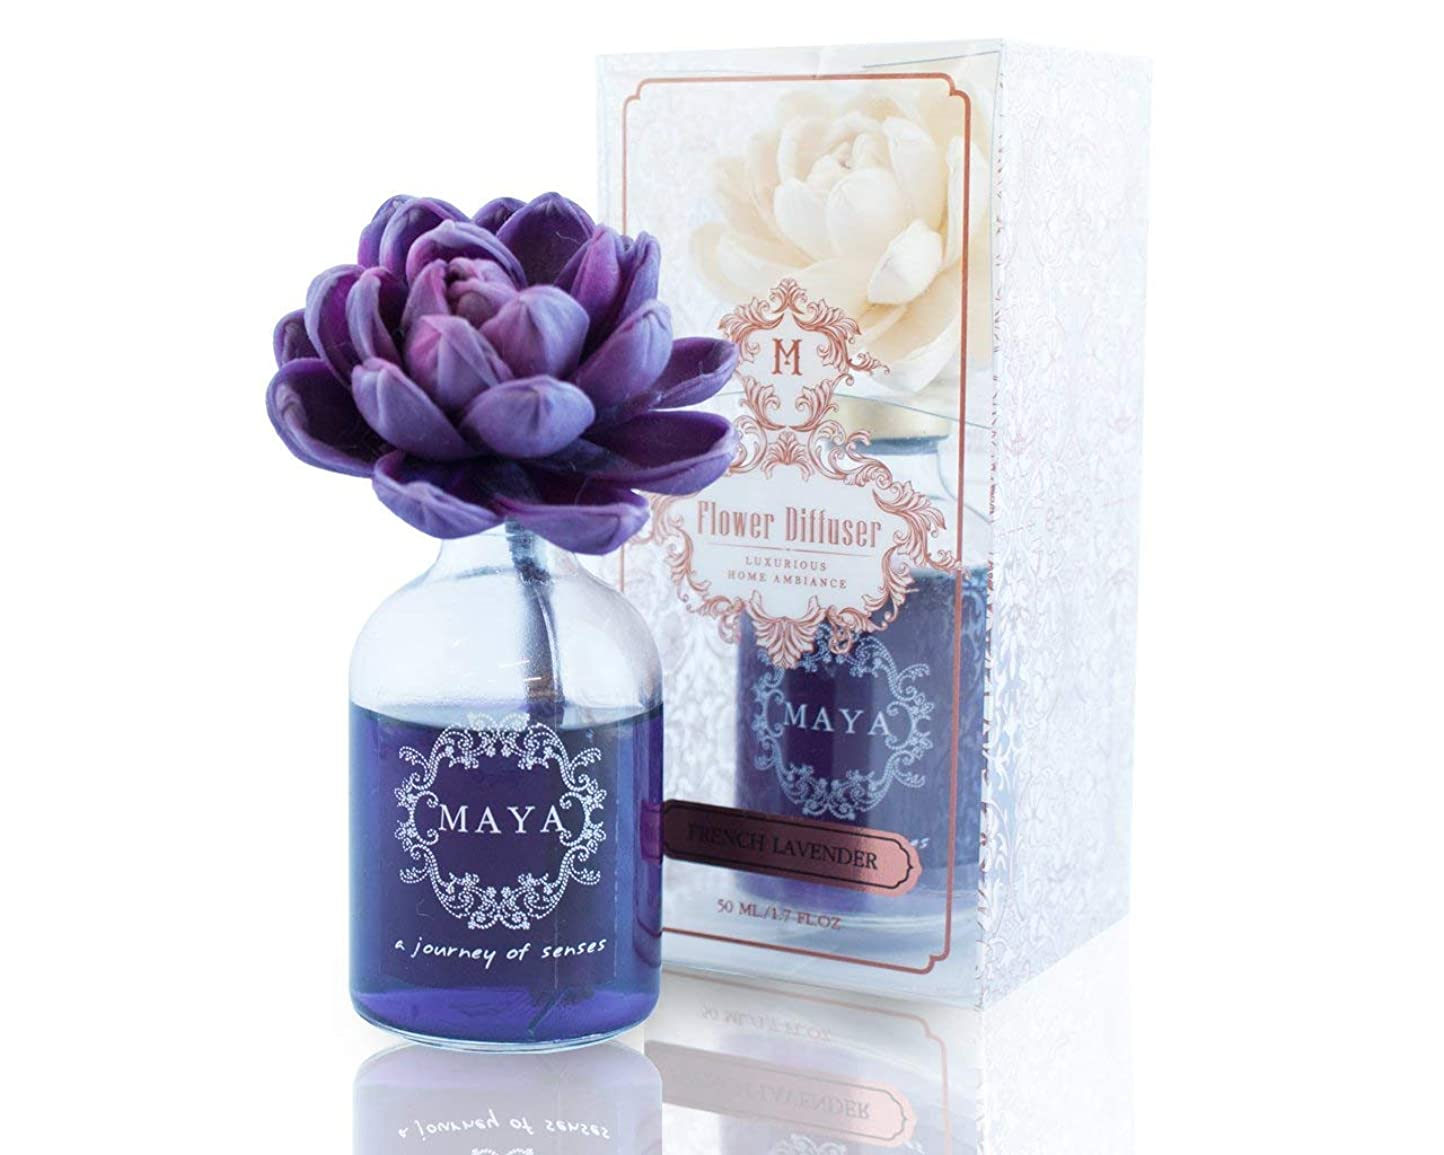 MAYA フラワーディフューザー フレンチラベンダー 50ml [並行輸入品] |Aroma Flower Diffuser - FRENCH LAVENDER 50ml